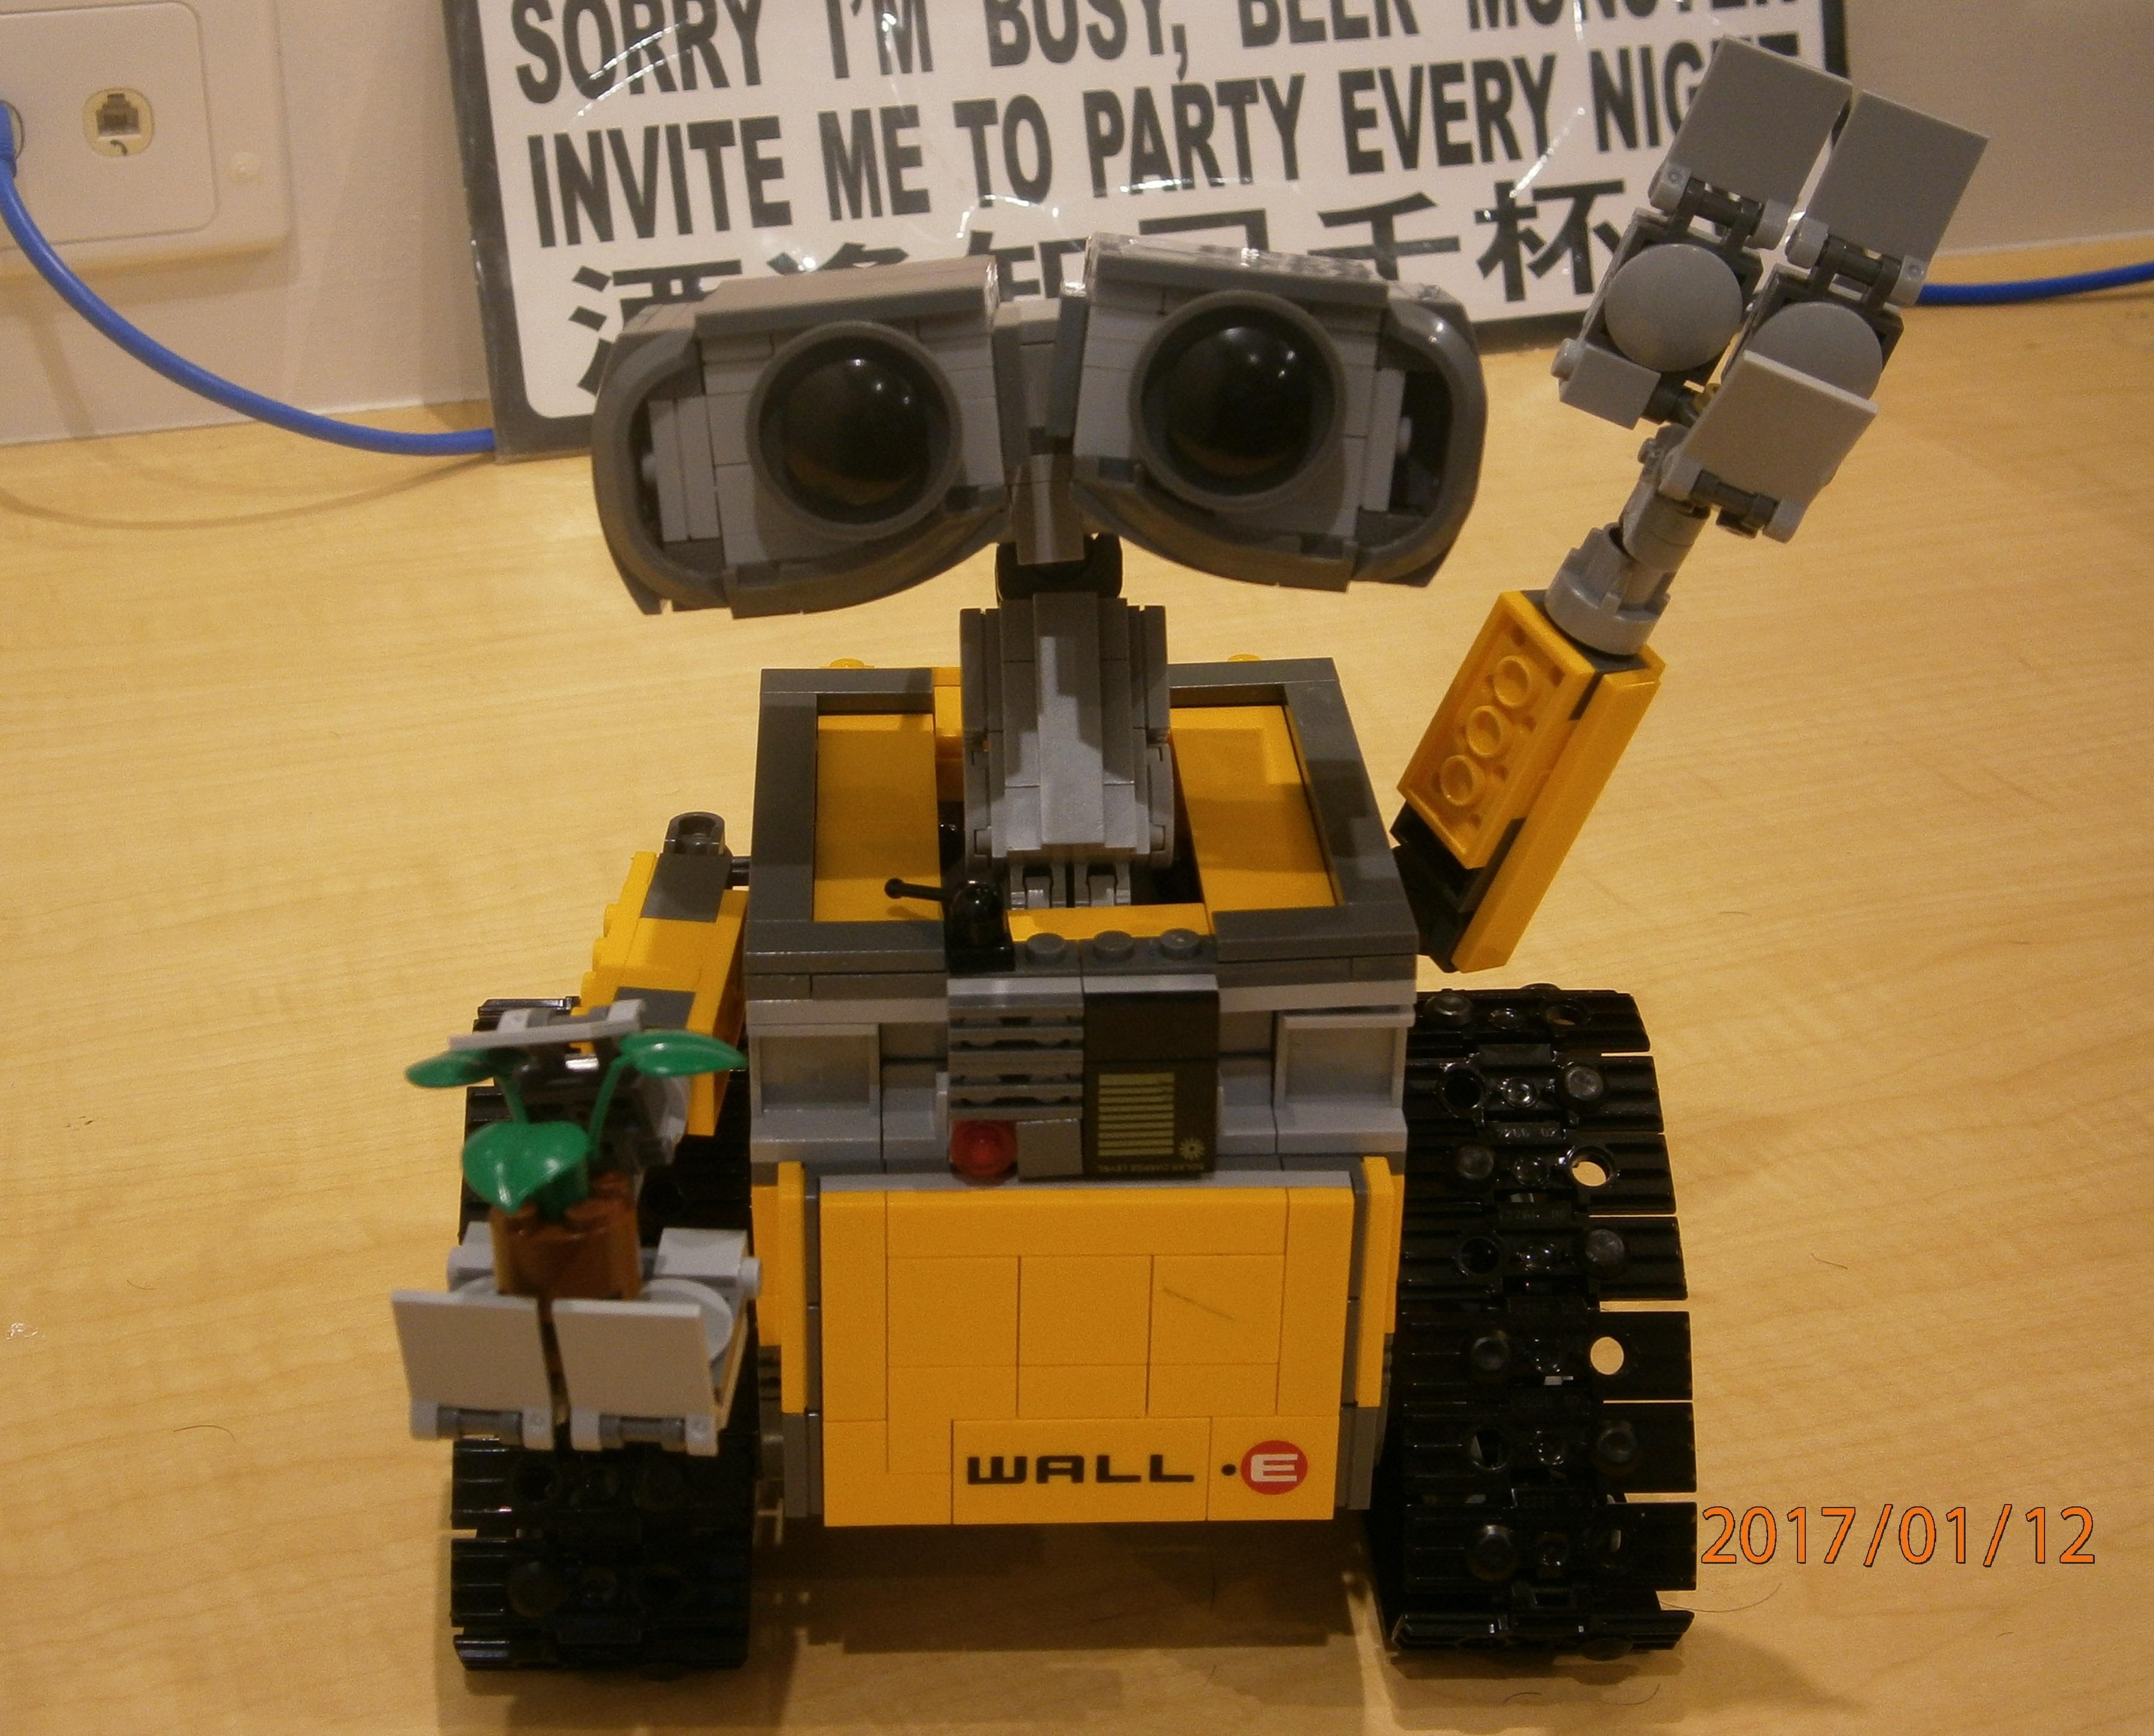 Lepin Wall E Copy Of Lego Wall E Review Lepin